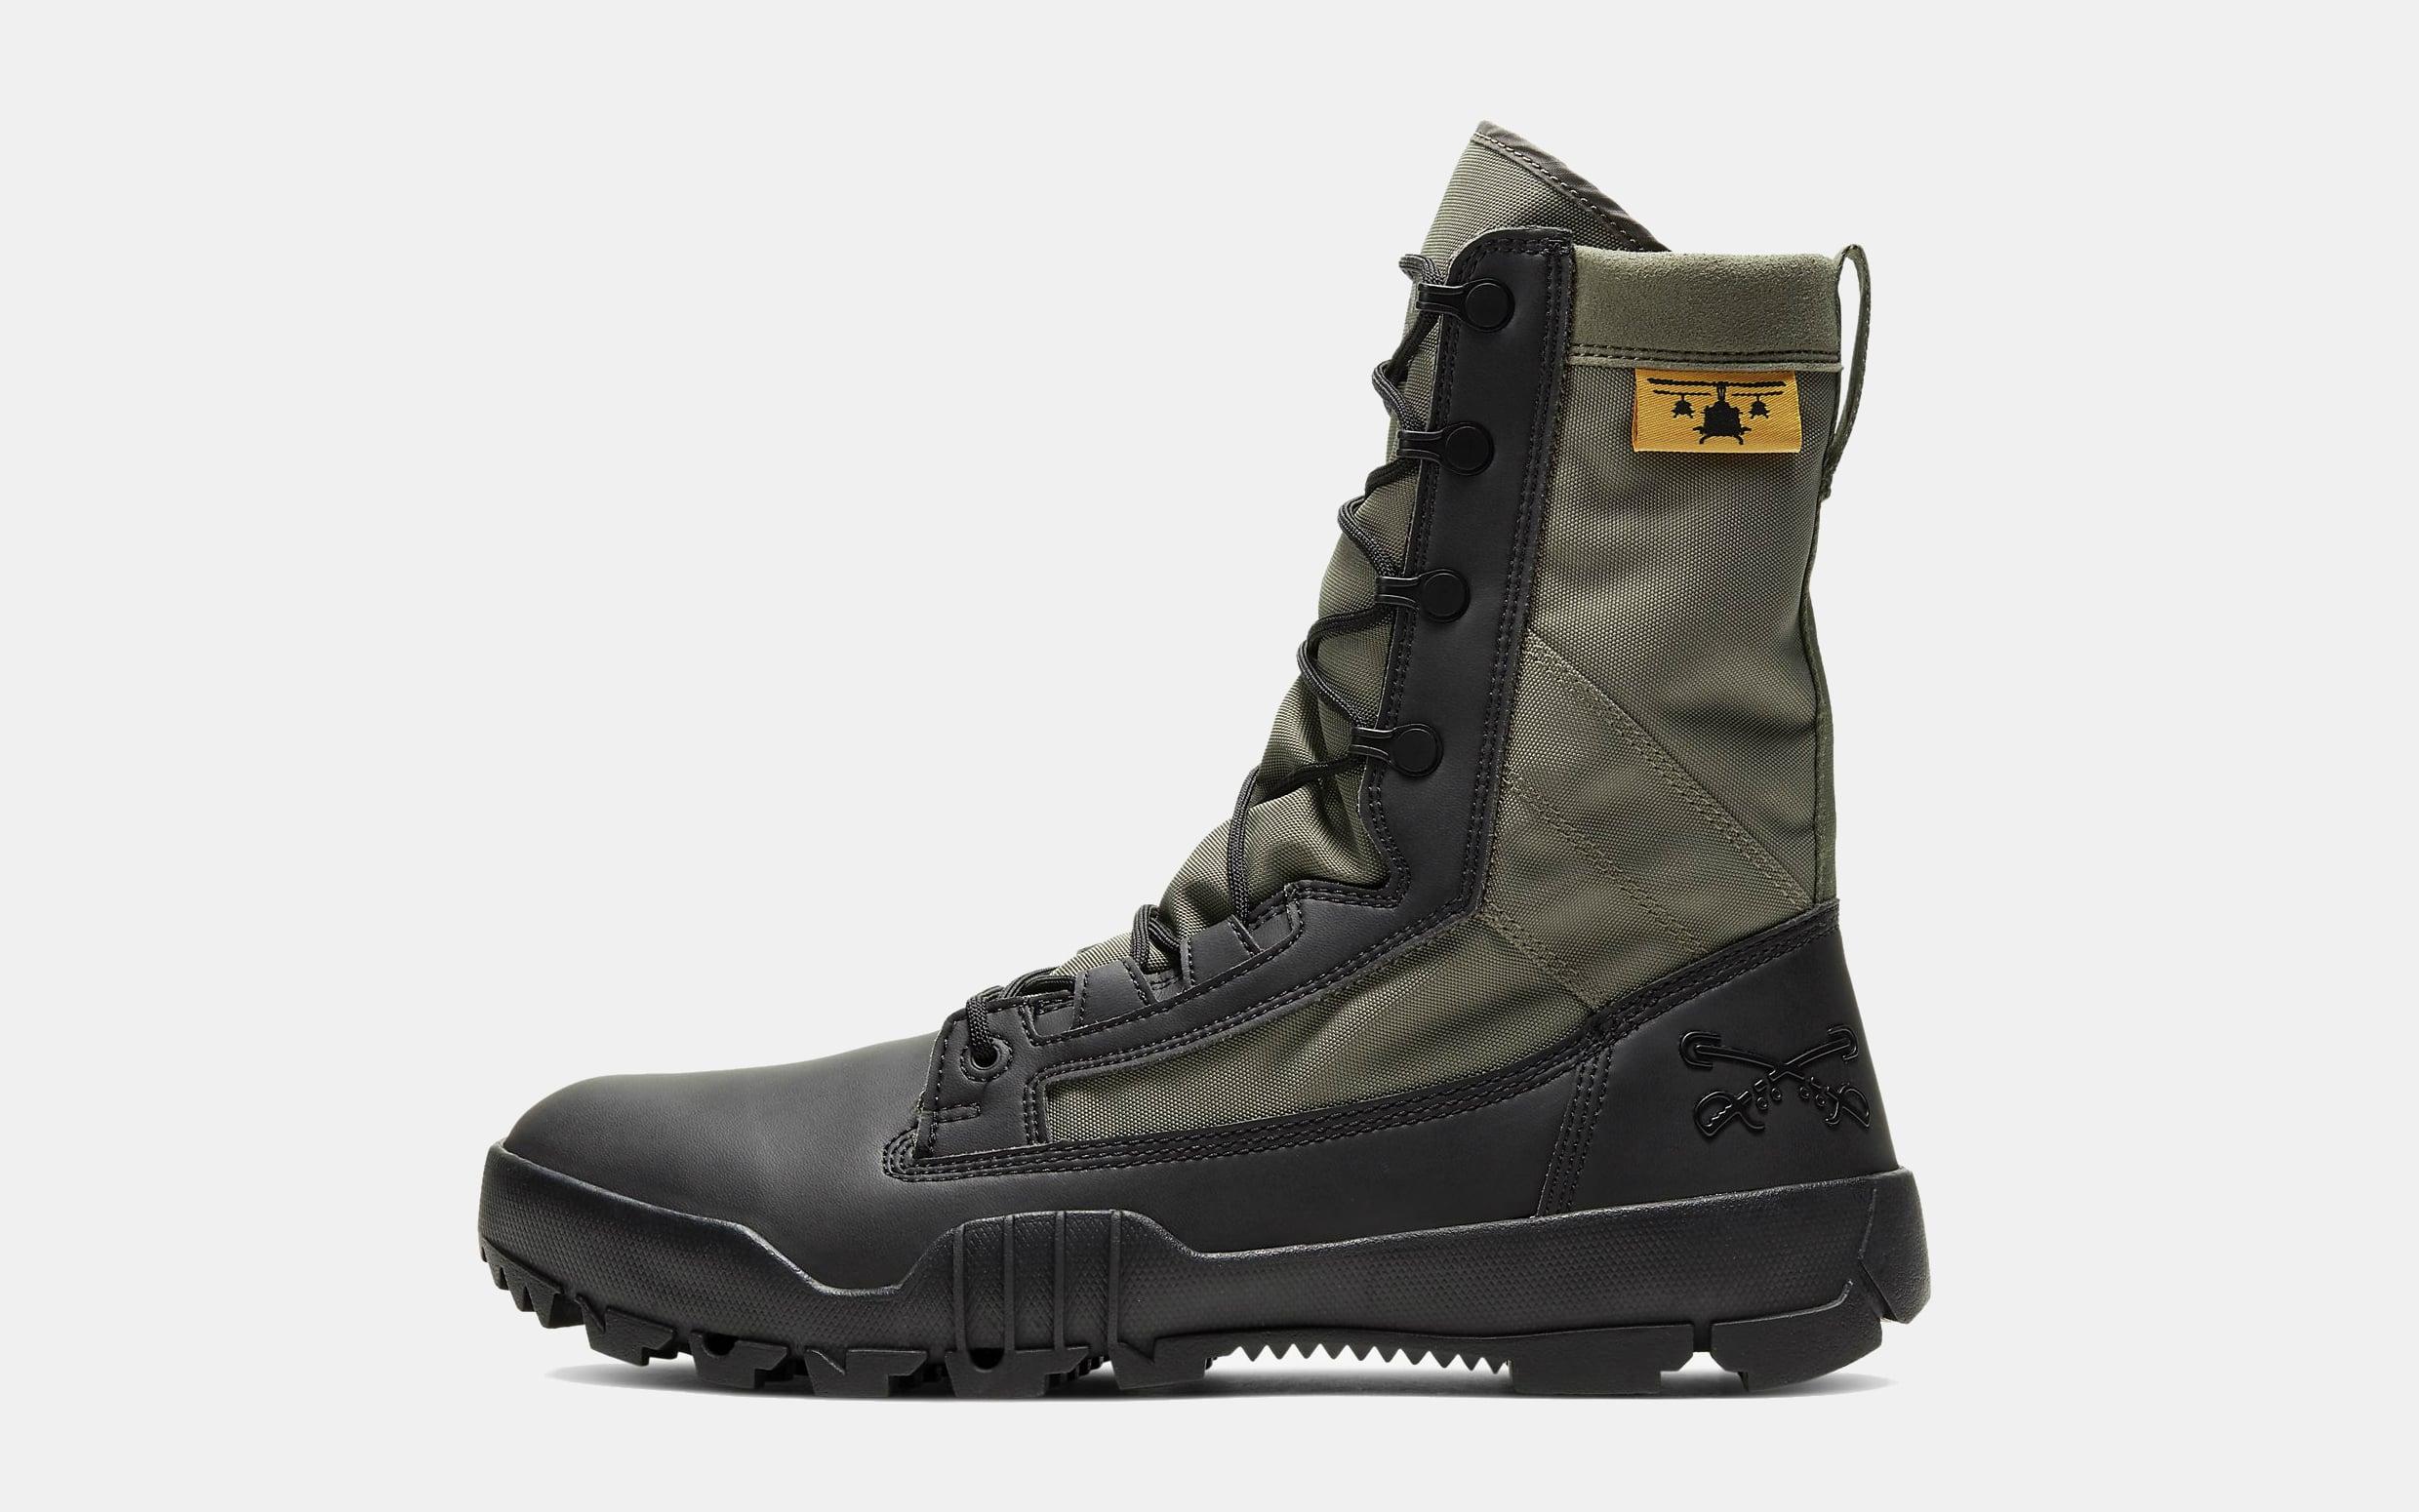 Nike SFB Jungle WP Tactical Boot